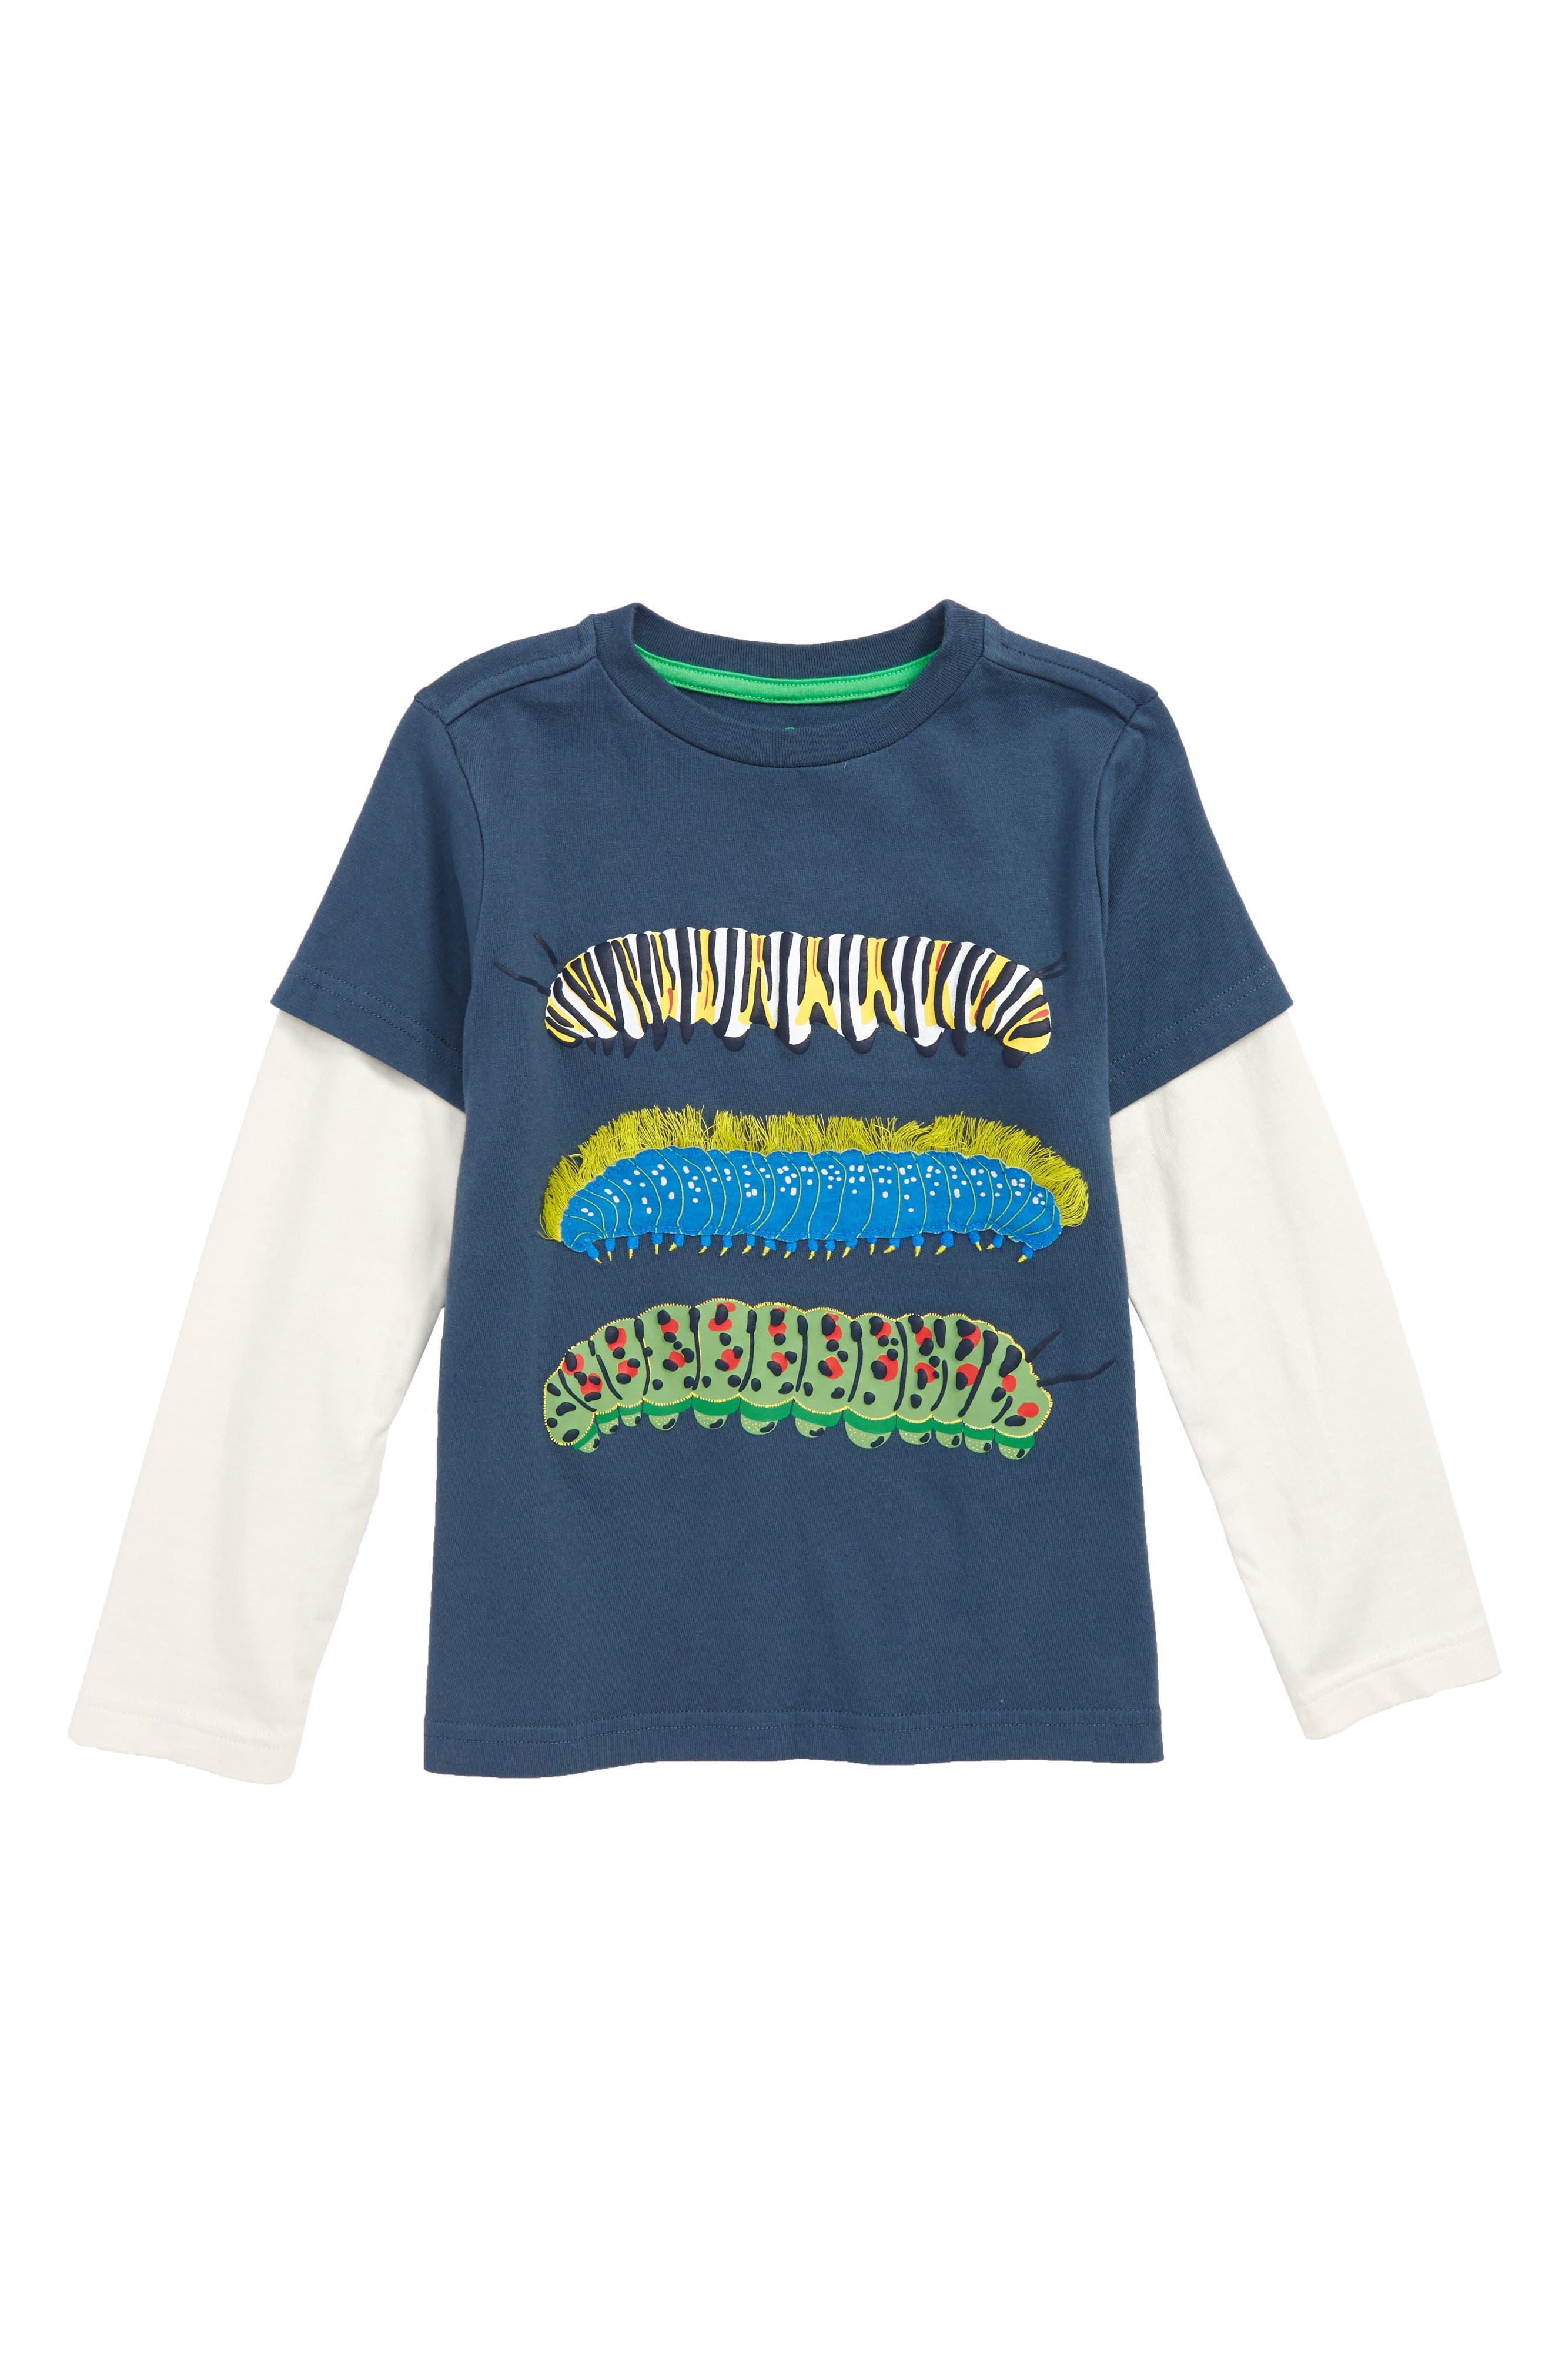 MINI BODEN Creepy Crawly Caterpillars Layered T-Shirt, Main, color, 400